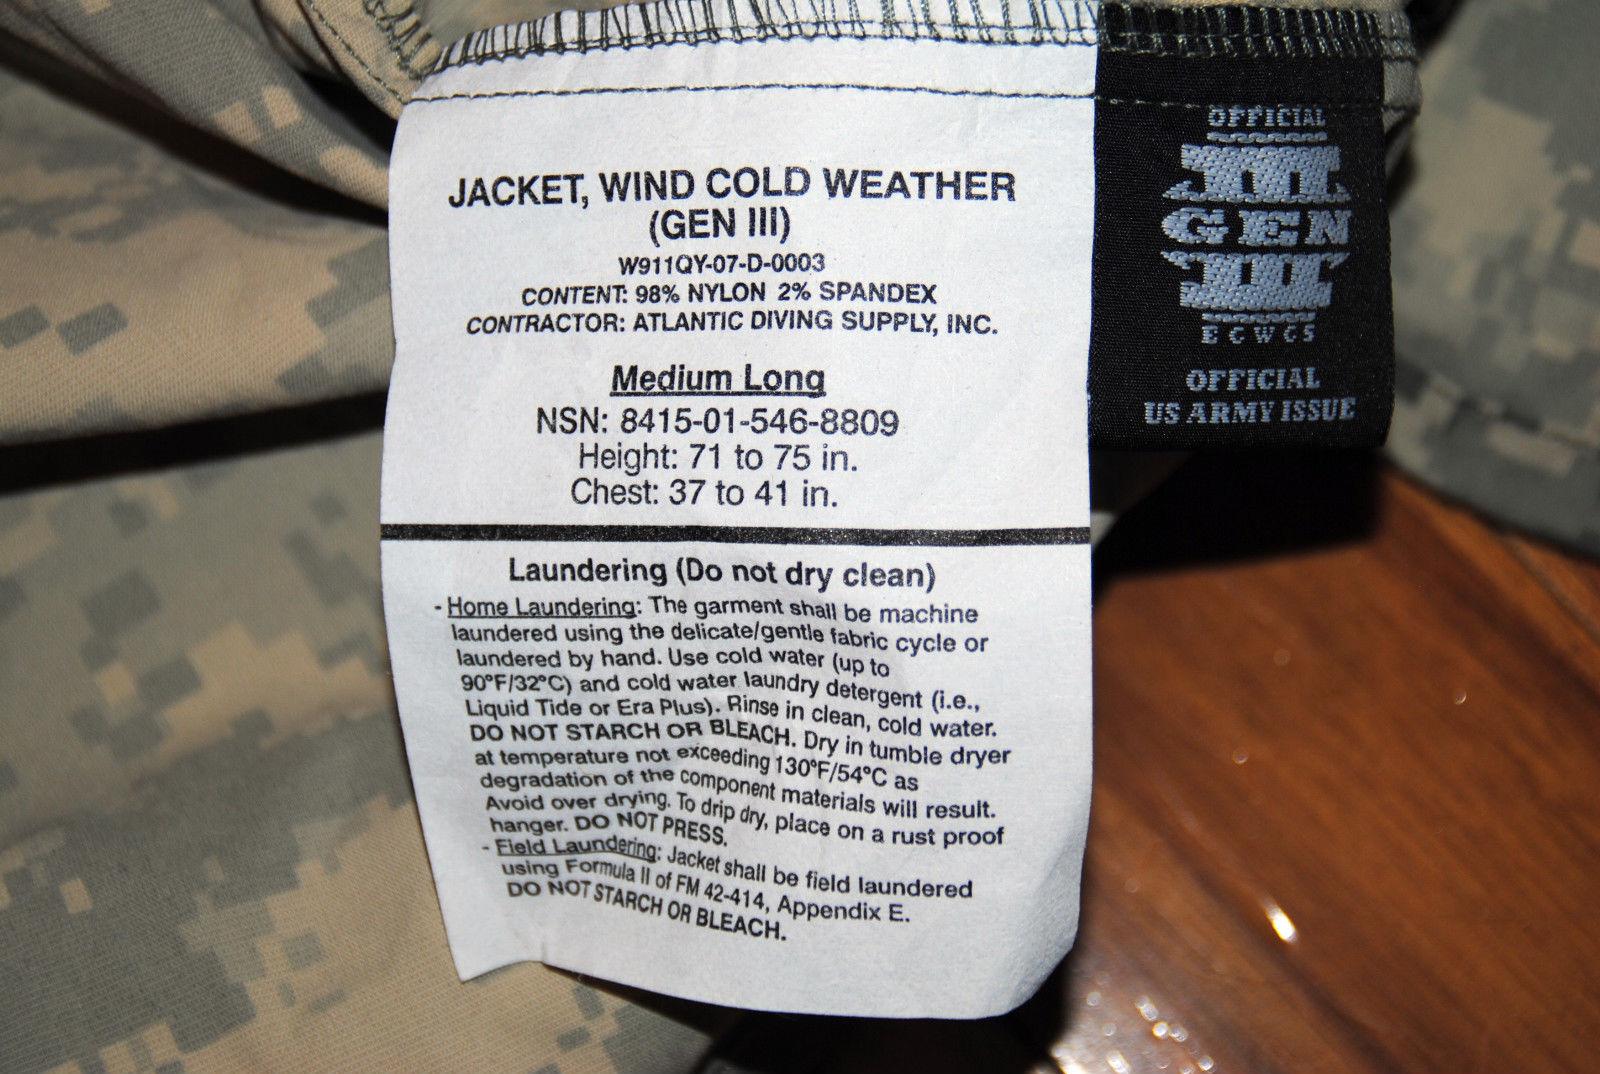 NWT US MILITARY ECWCS ACU GEN III LEVEL 4 WIND COLD WEATHER JACKET - MEDIUM LONG